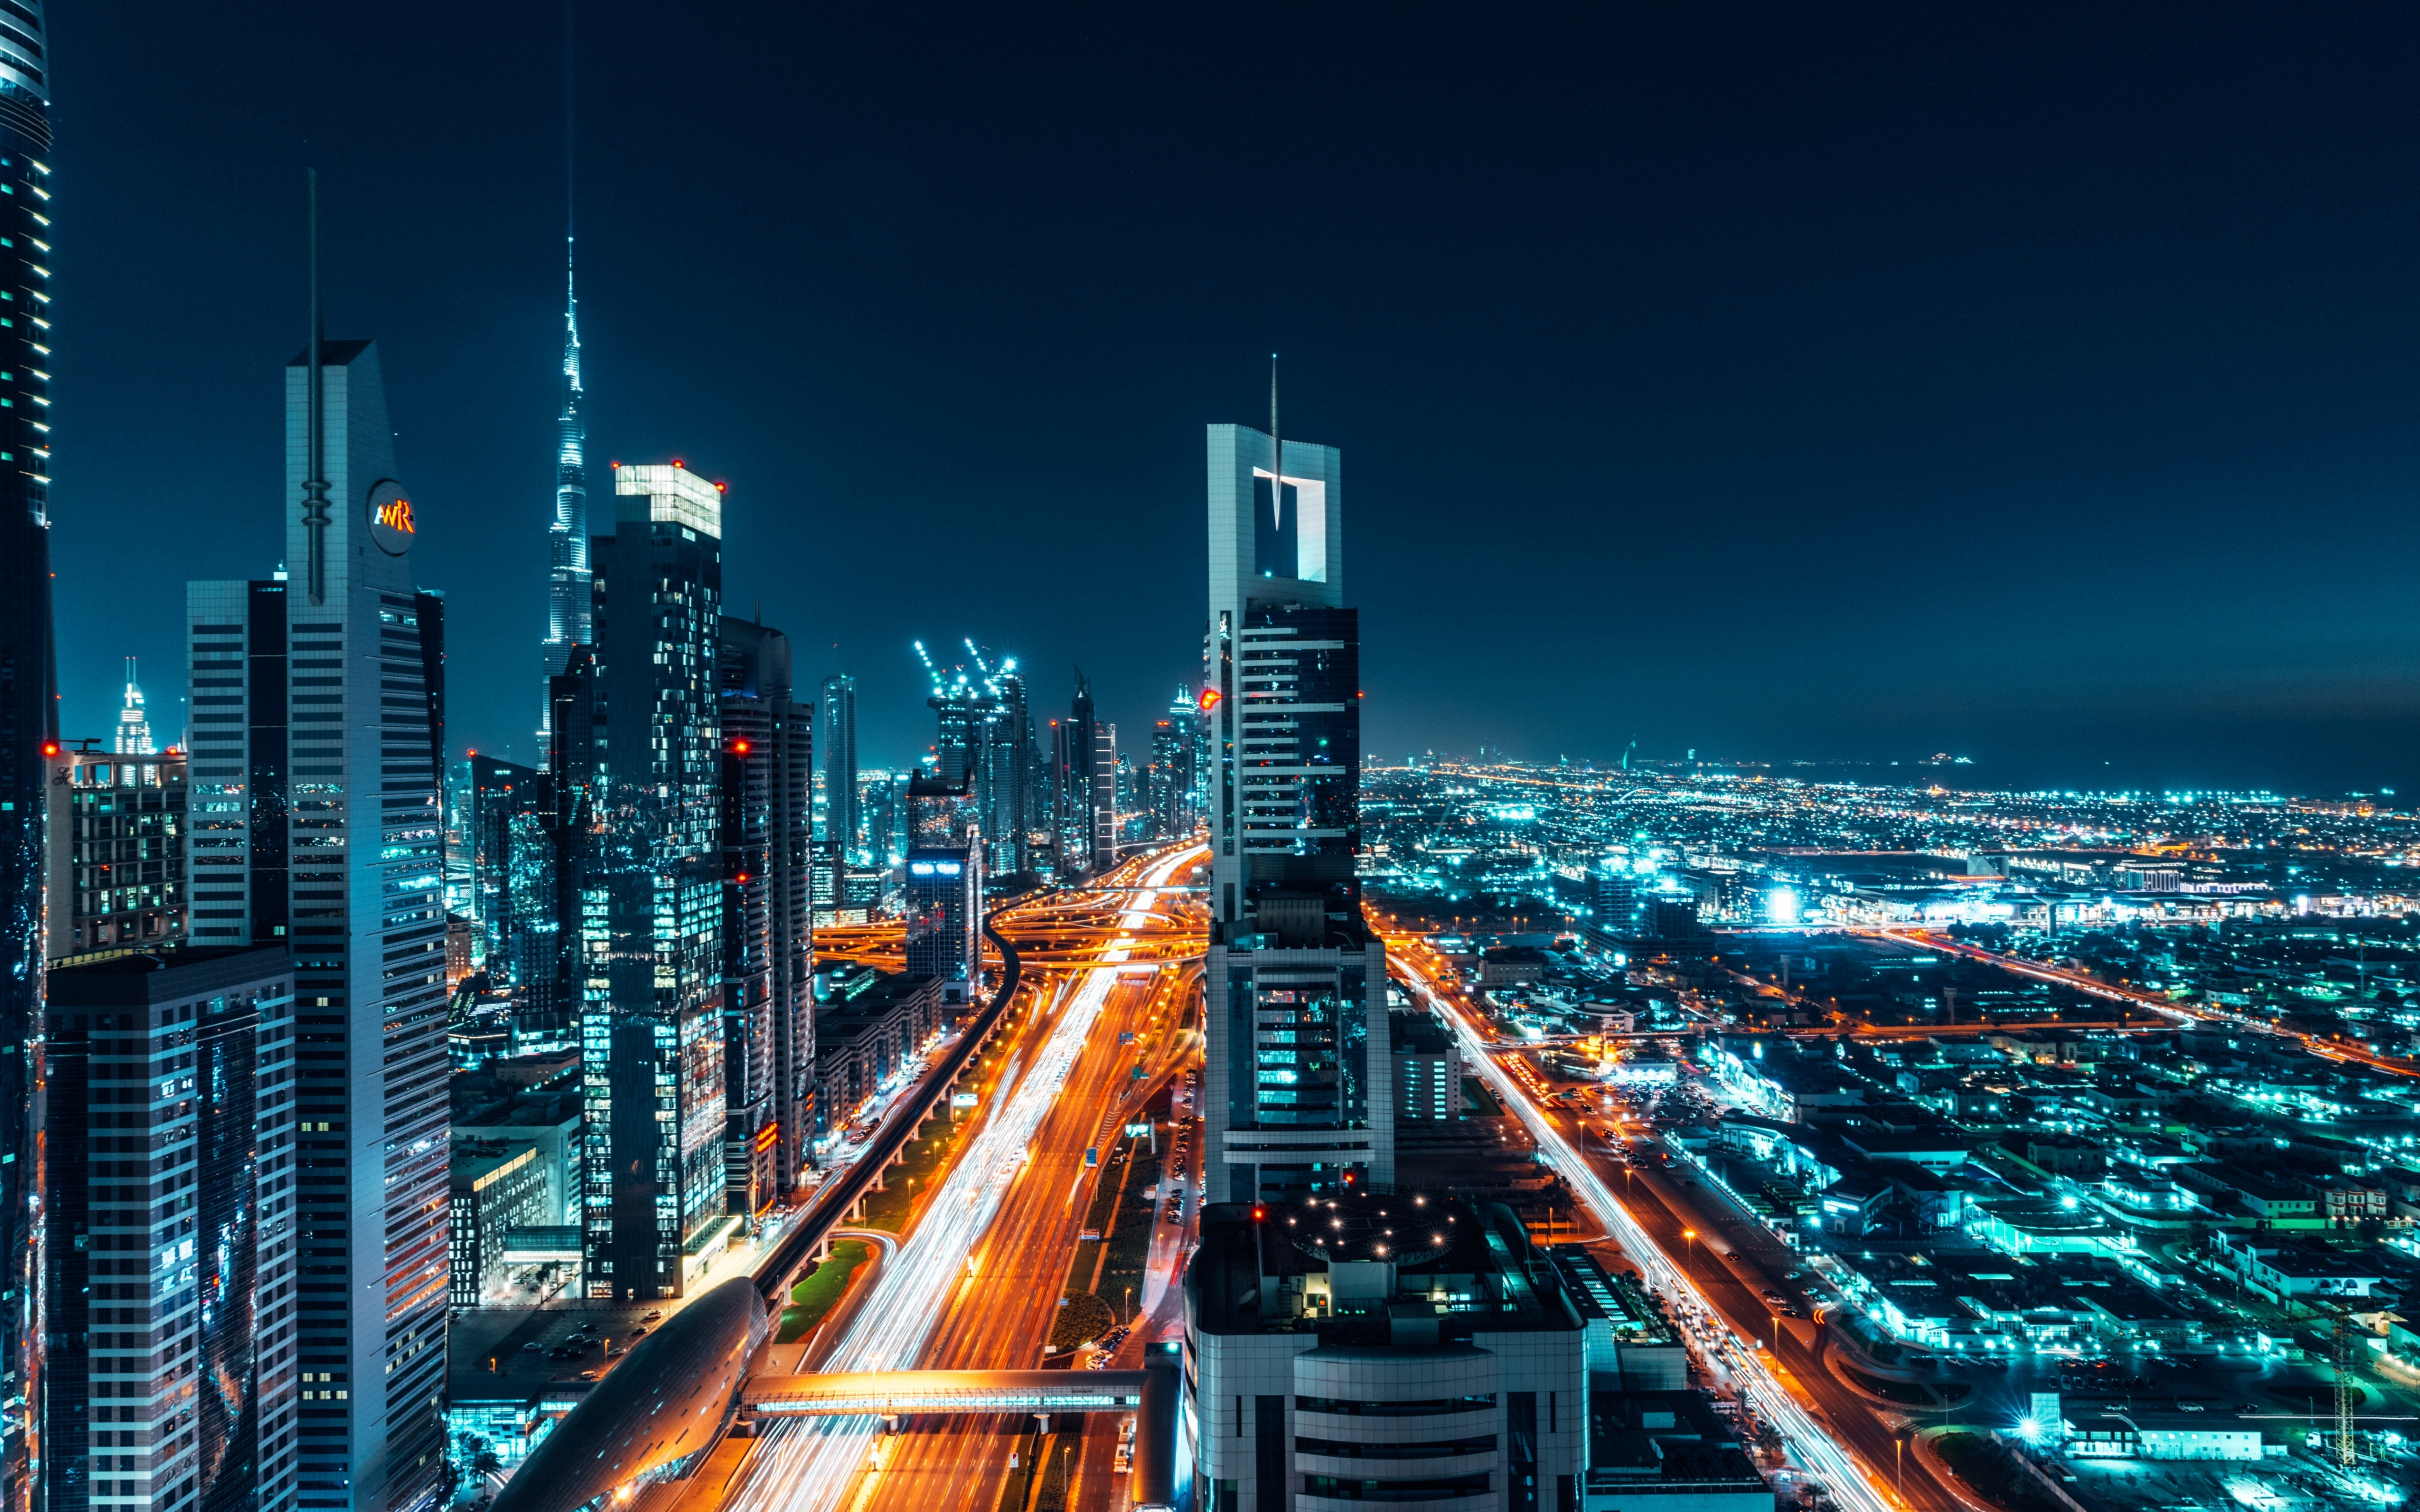 Most Inspiring Wallpaper Mac Dubai - dubai-buildings-cityscape-night-8k  Photograph_433463.jpg